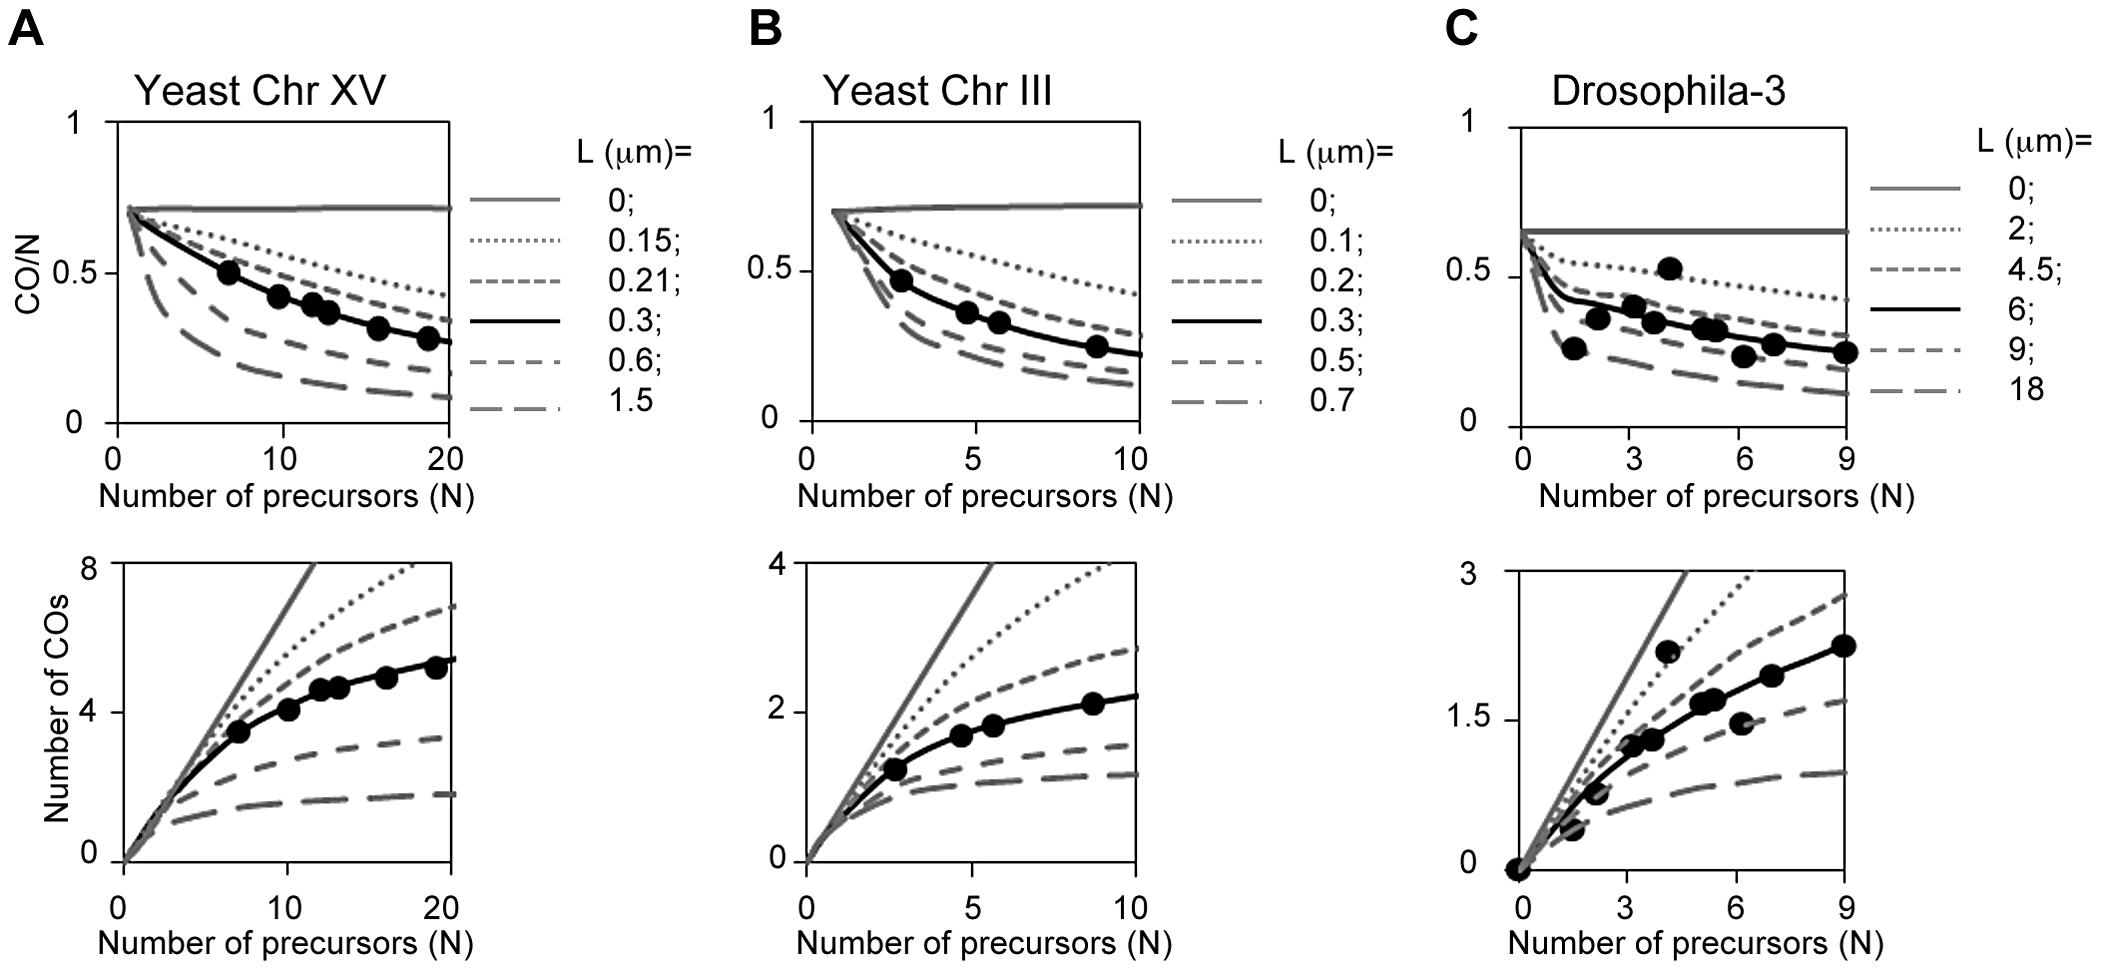 CO homeostasis in yeast, Drosophila, tomato and grasshopper.